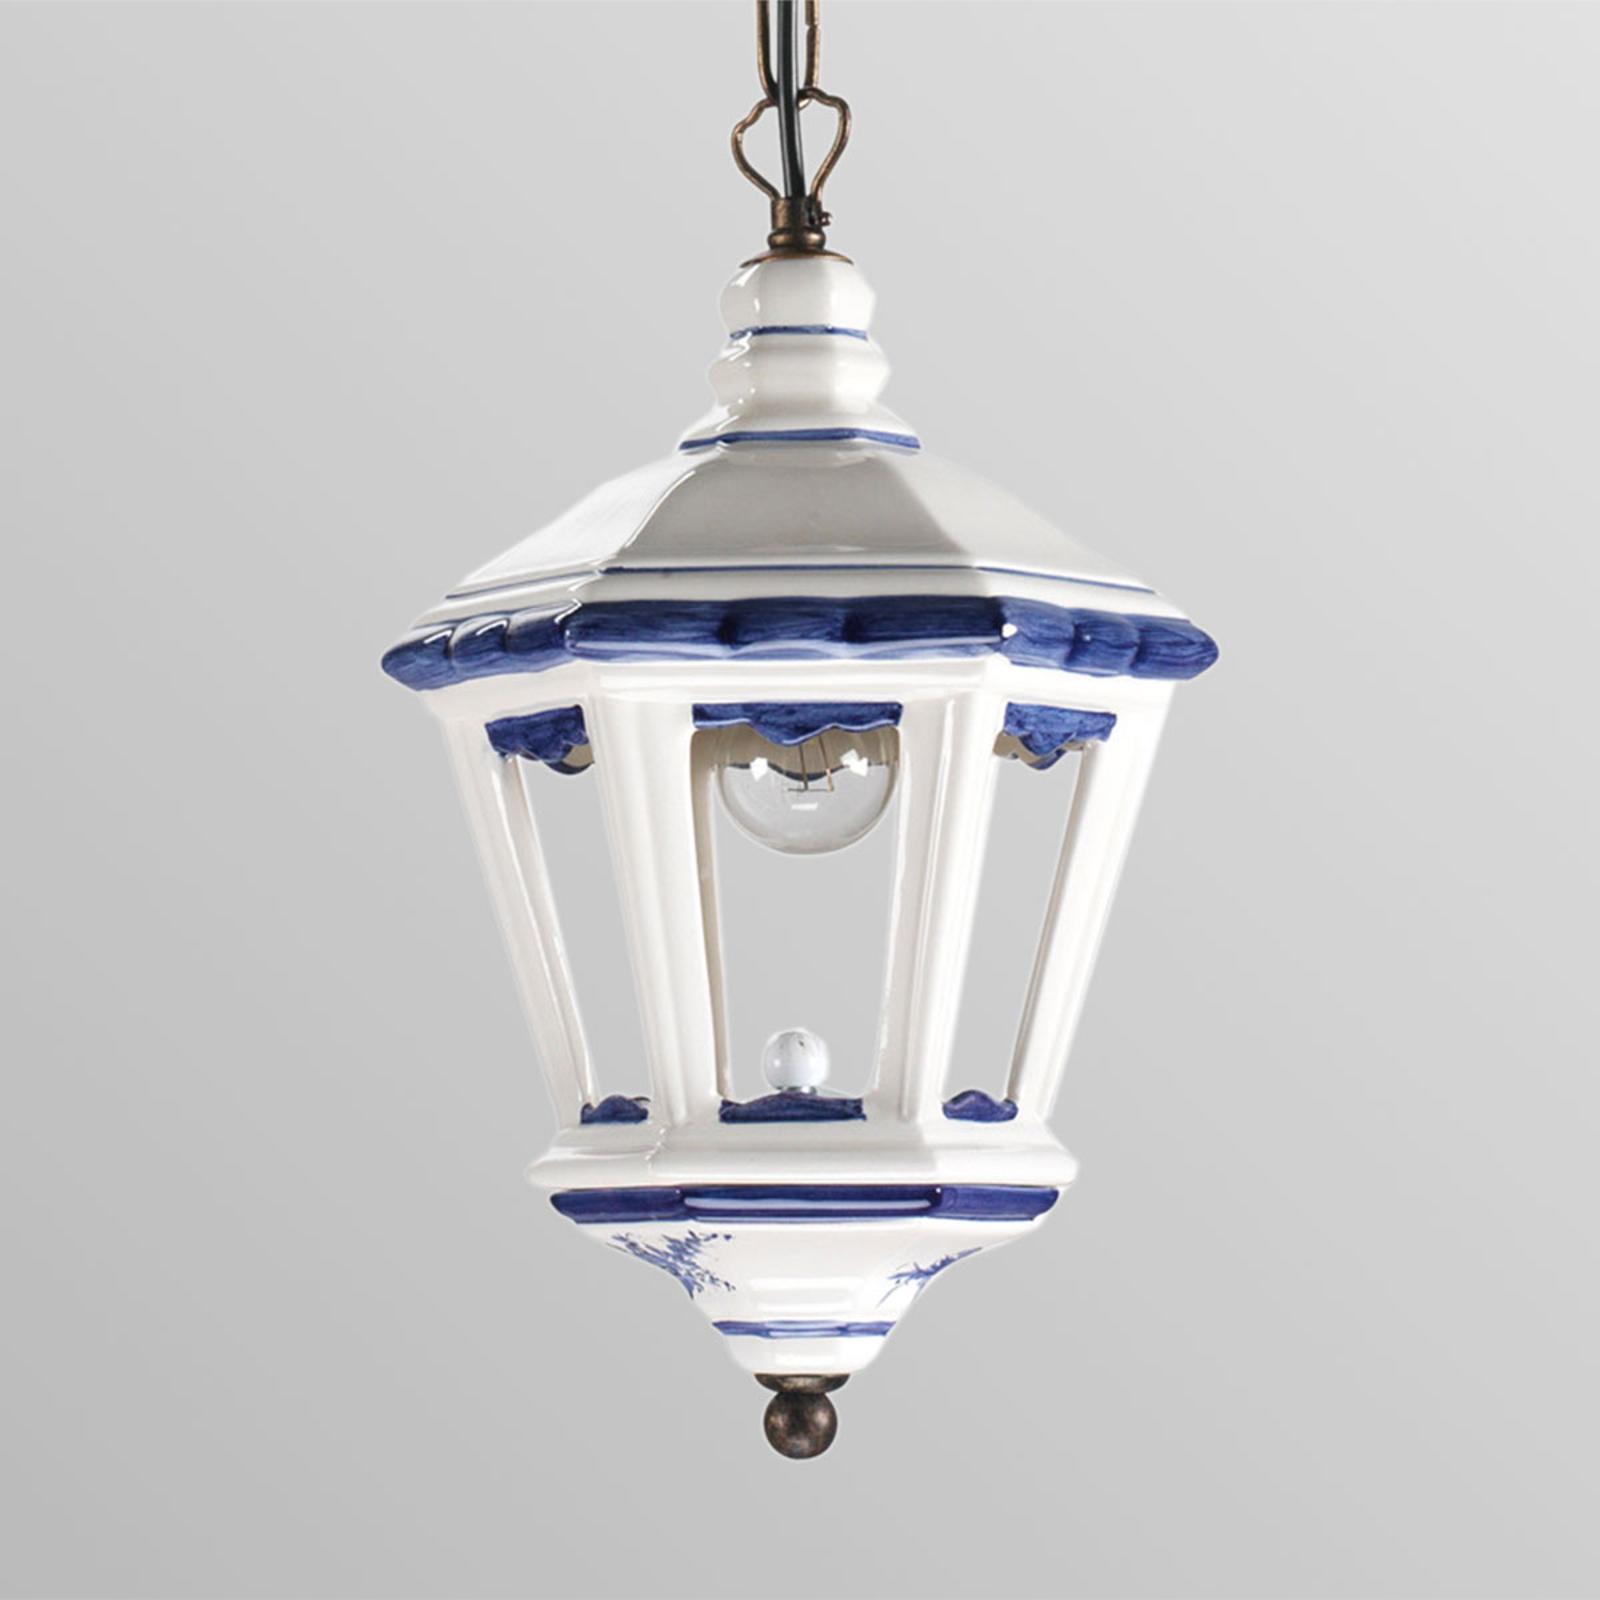 Adonia - lanterneformet hengelampe